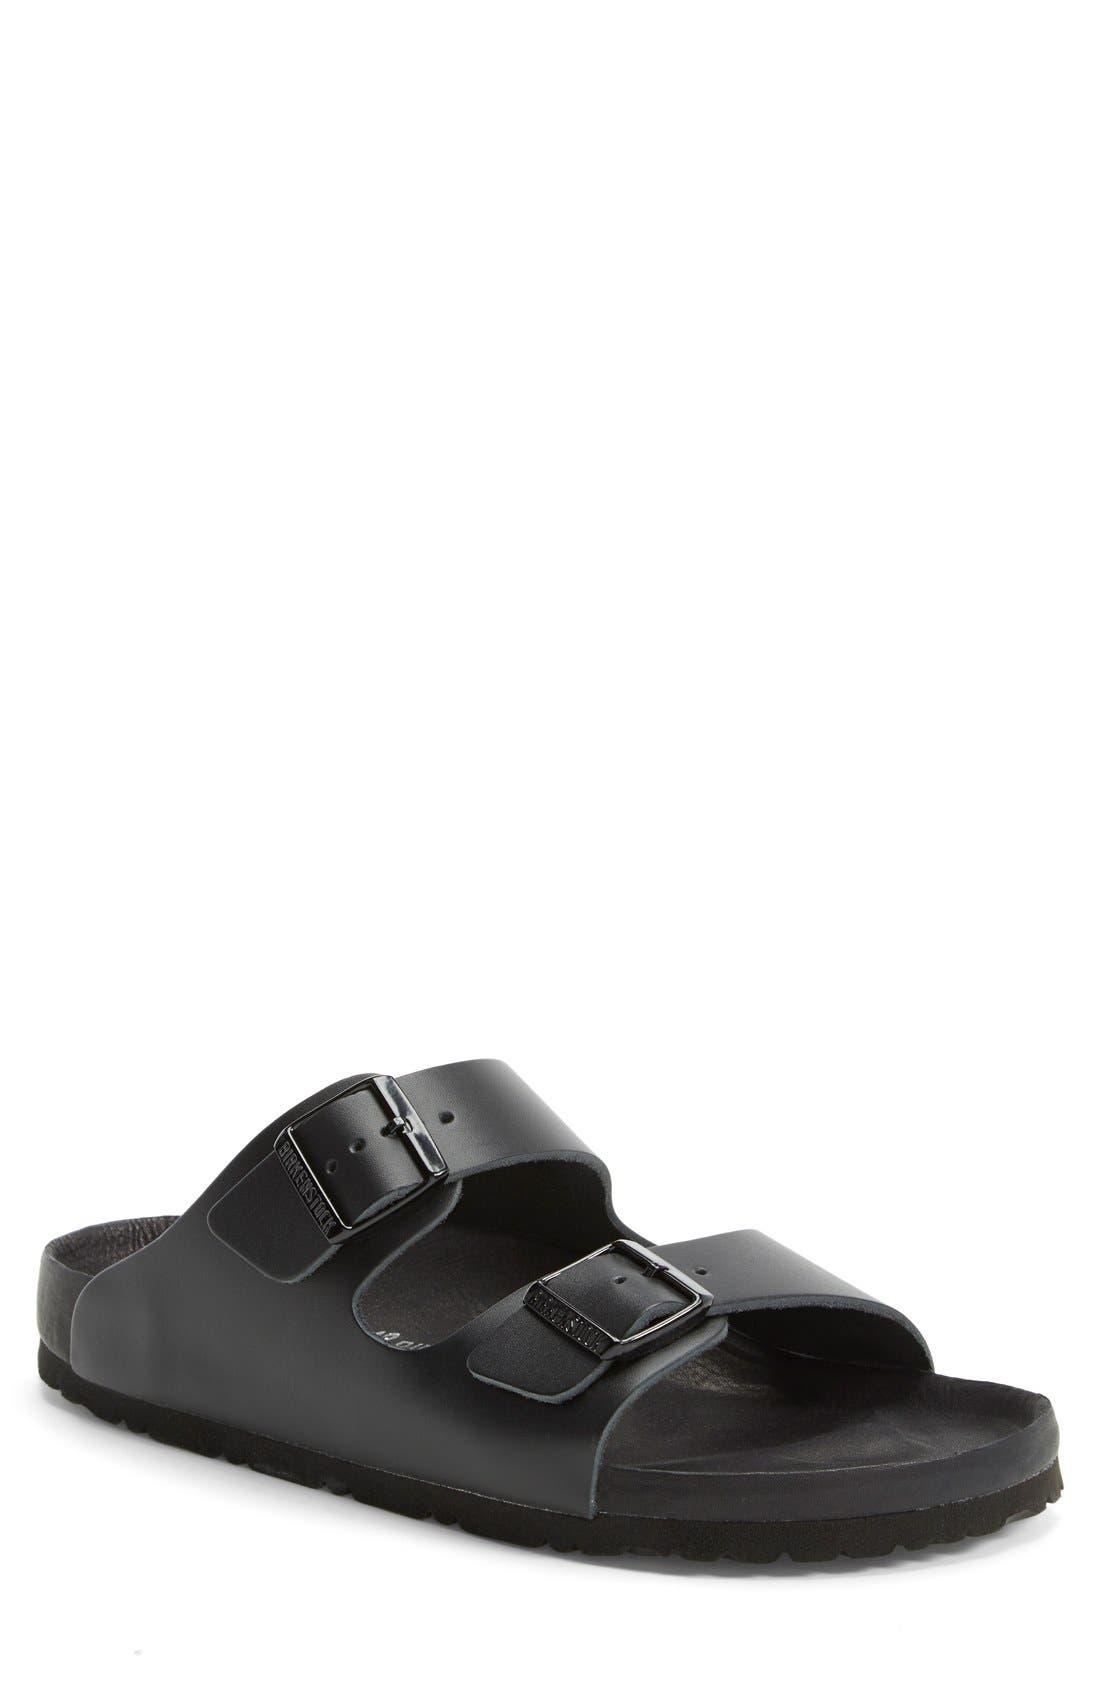 Monterey Leather Slide Sandal,                             Main thumbnail 1, color,                             001